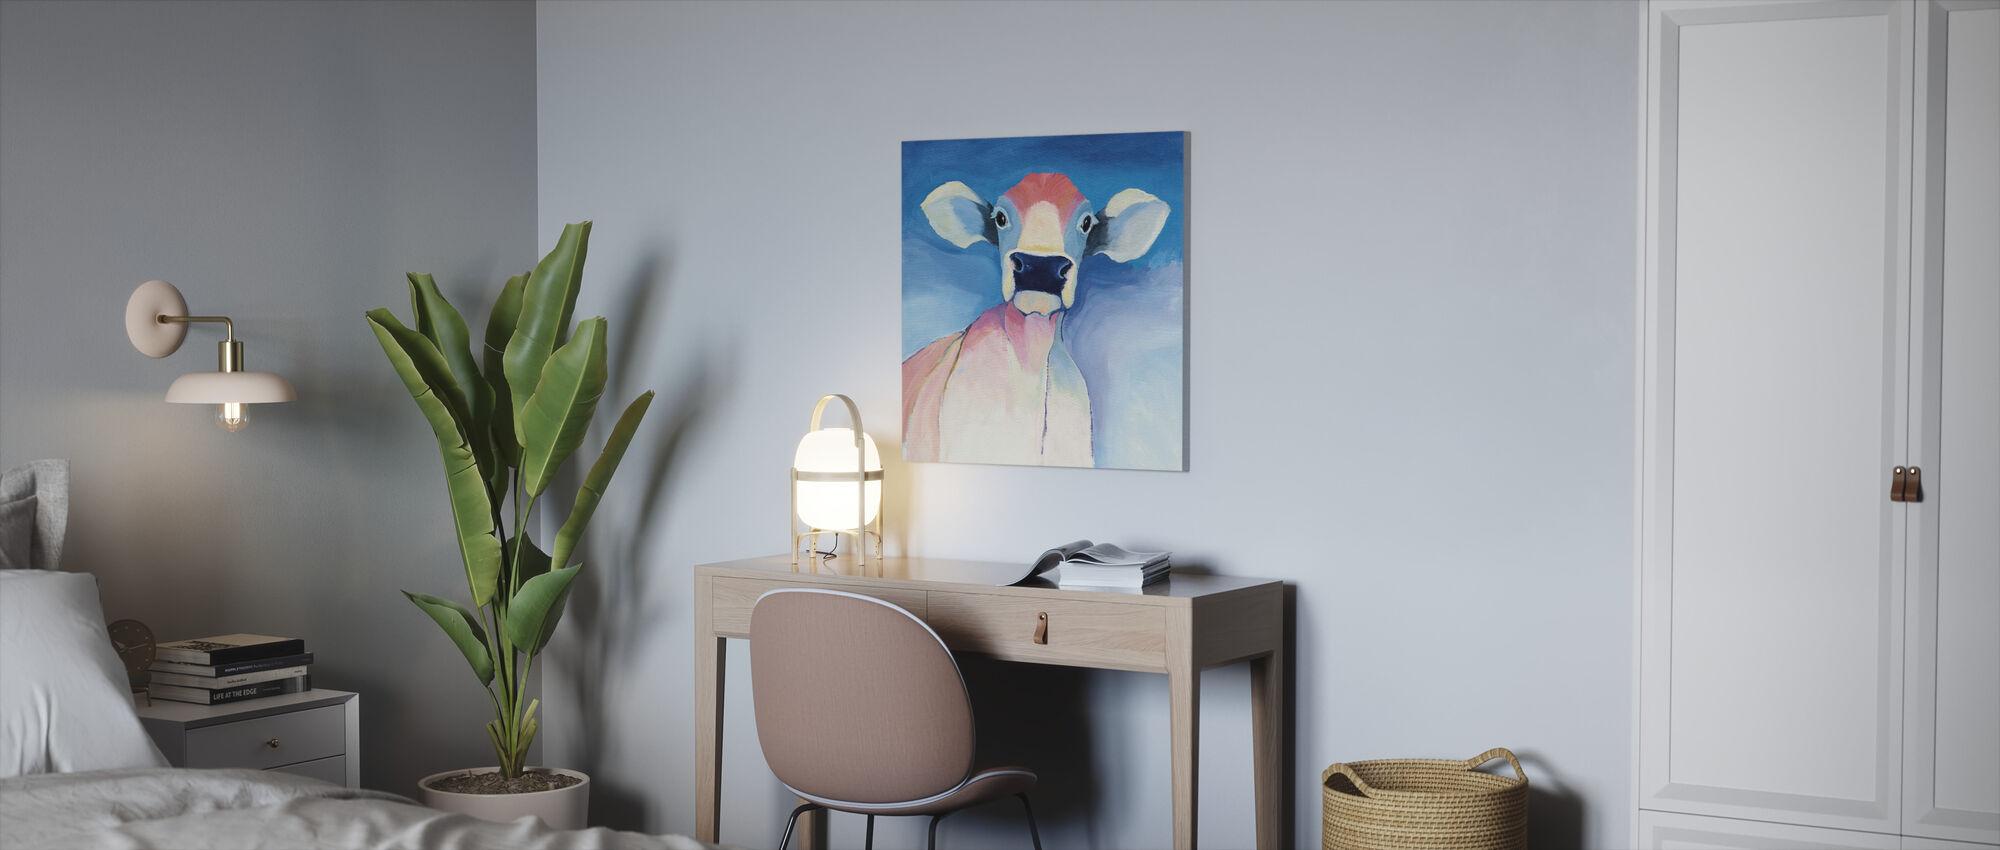 Bella Blue - Canvas print - Office